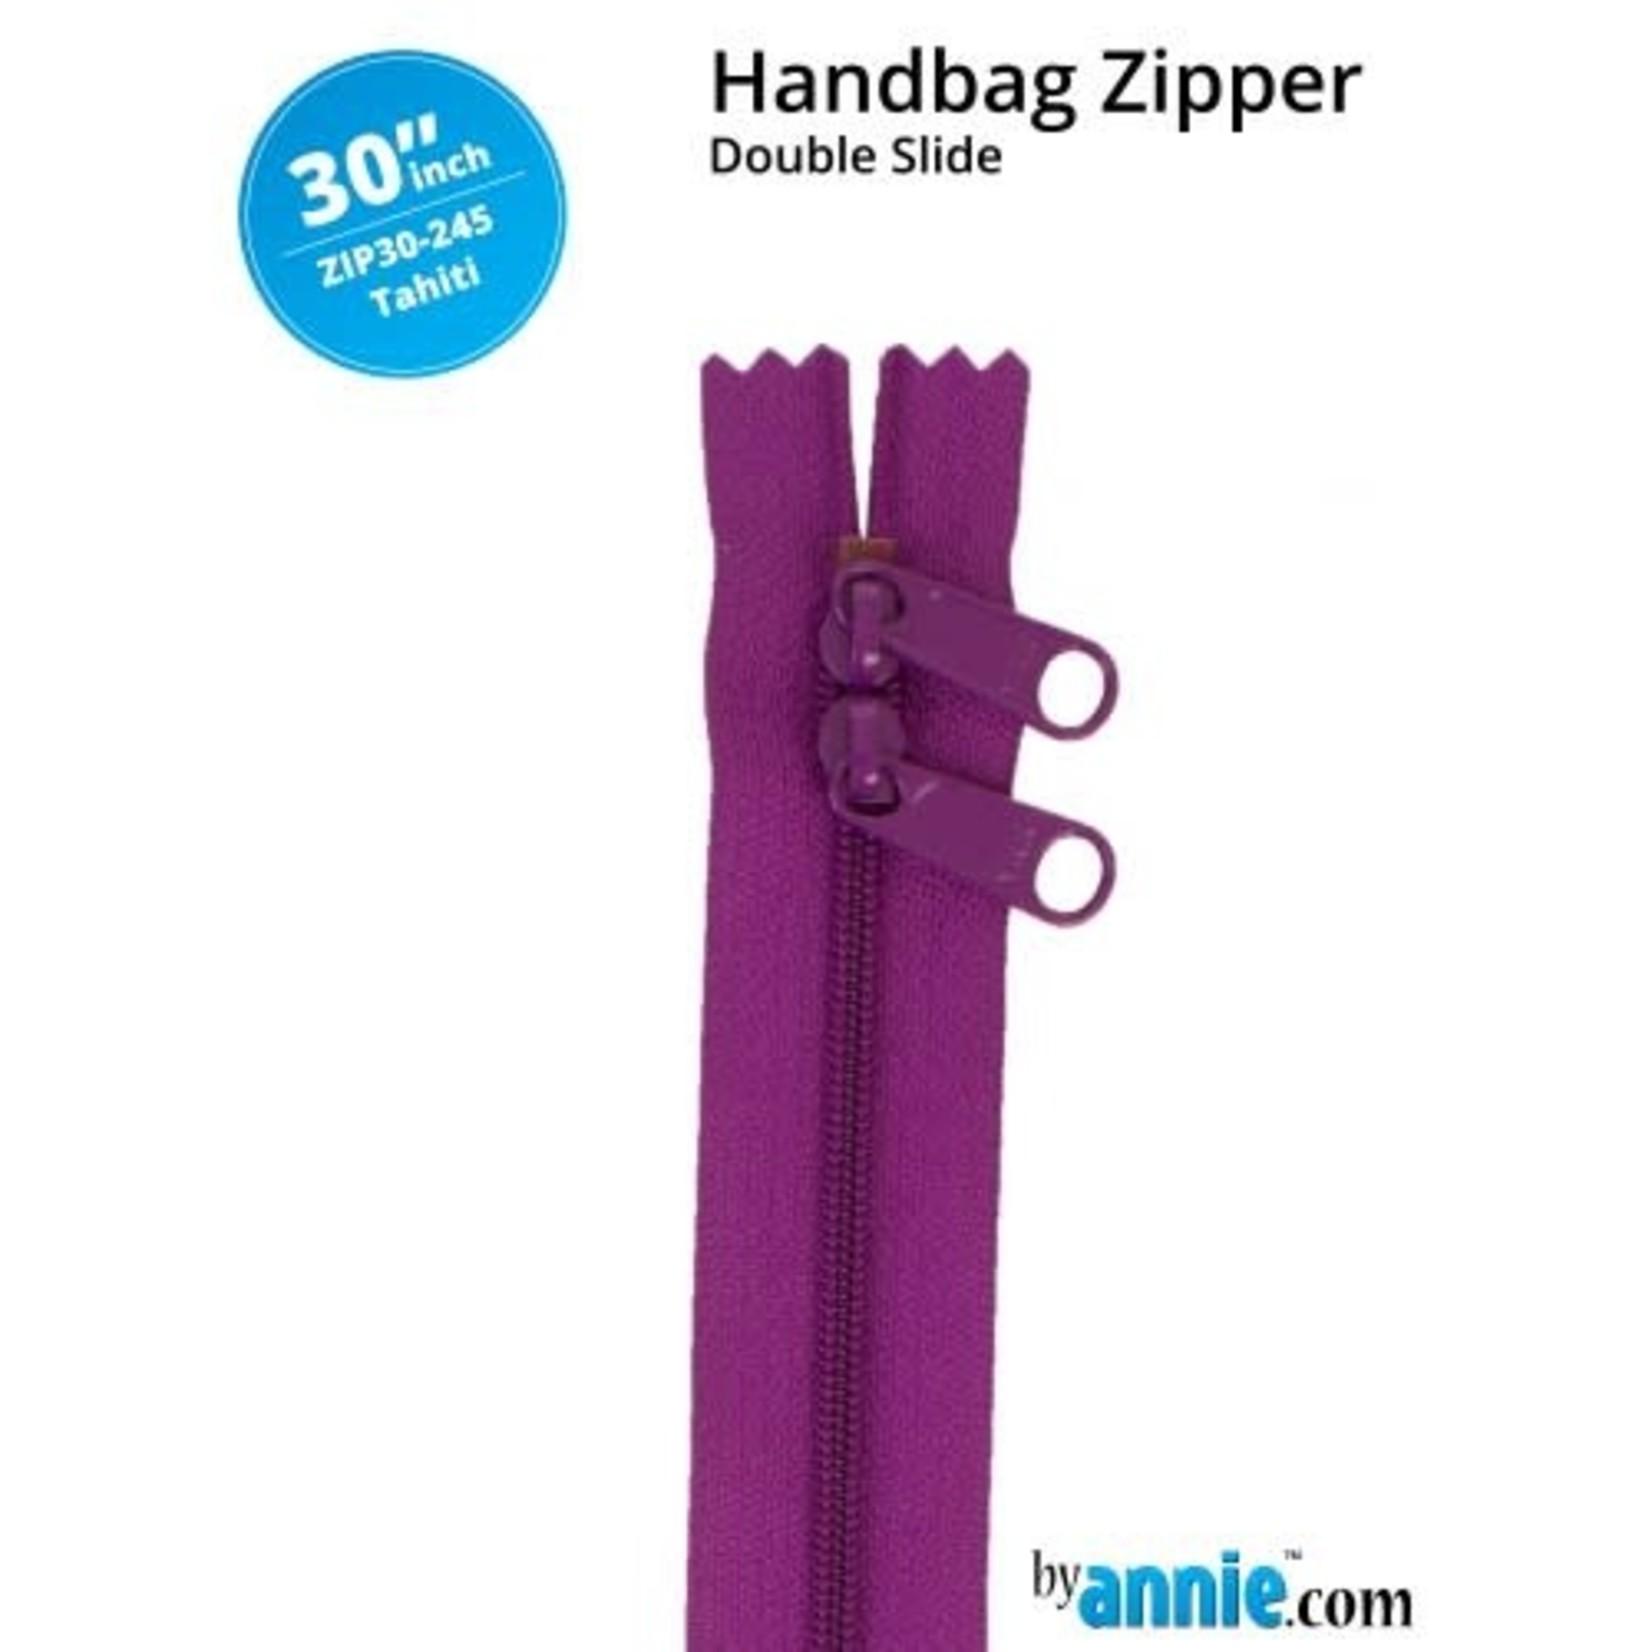 "By Annie Double Slide Handbag Zipper 30"" Rainbow 245 Tahiti"